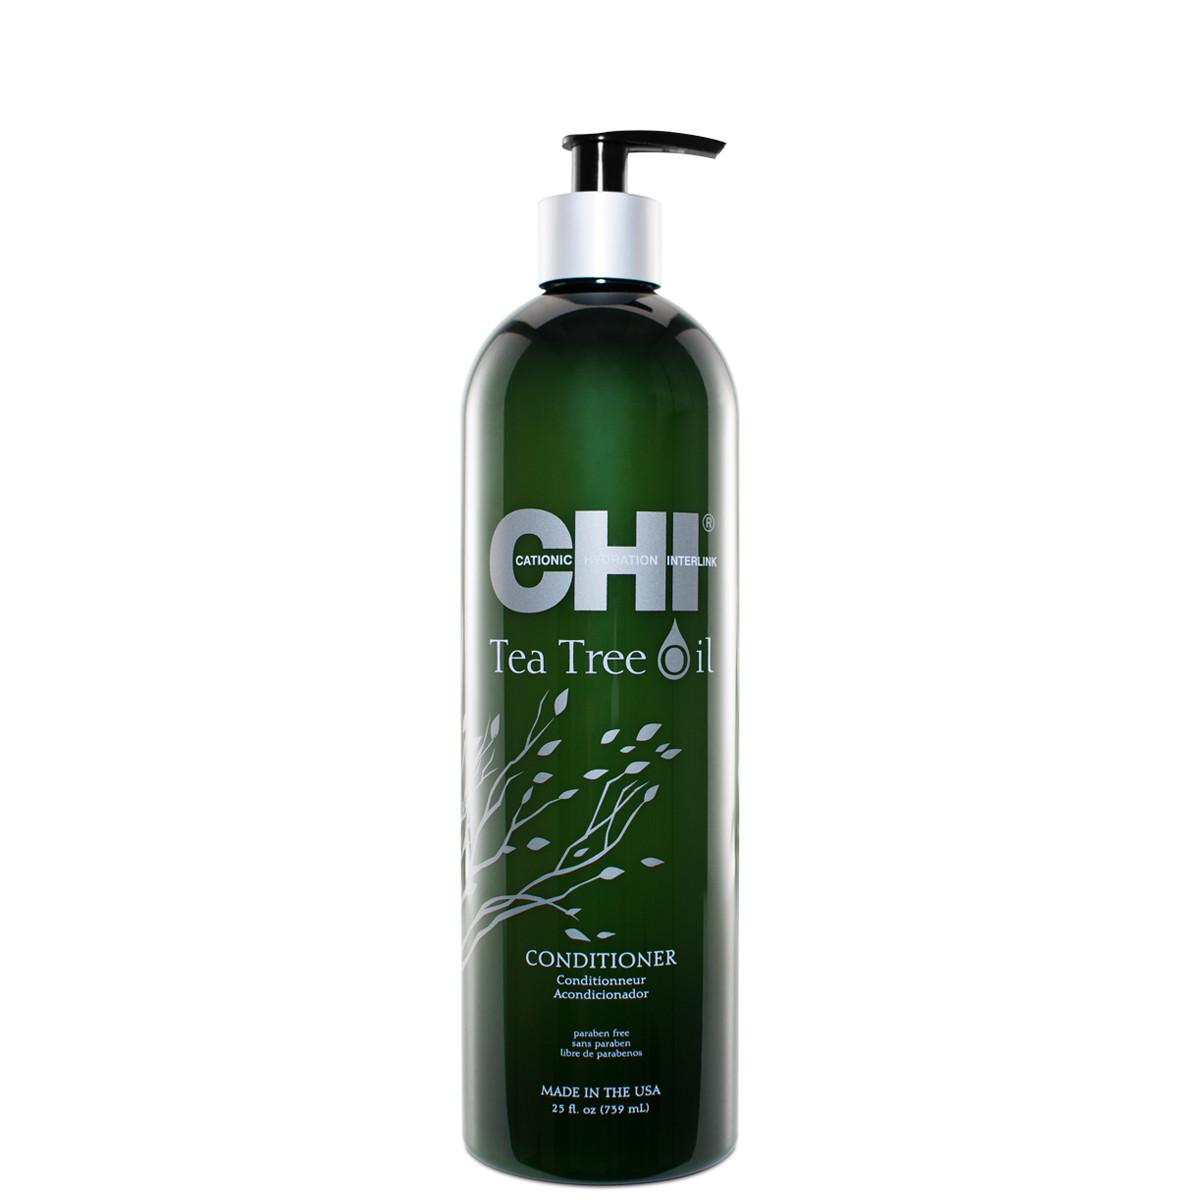 Кондиционер CHI Tea Tree Oil (разлив) 100 гр